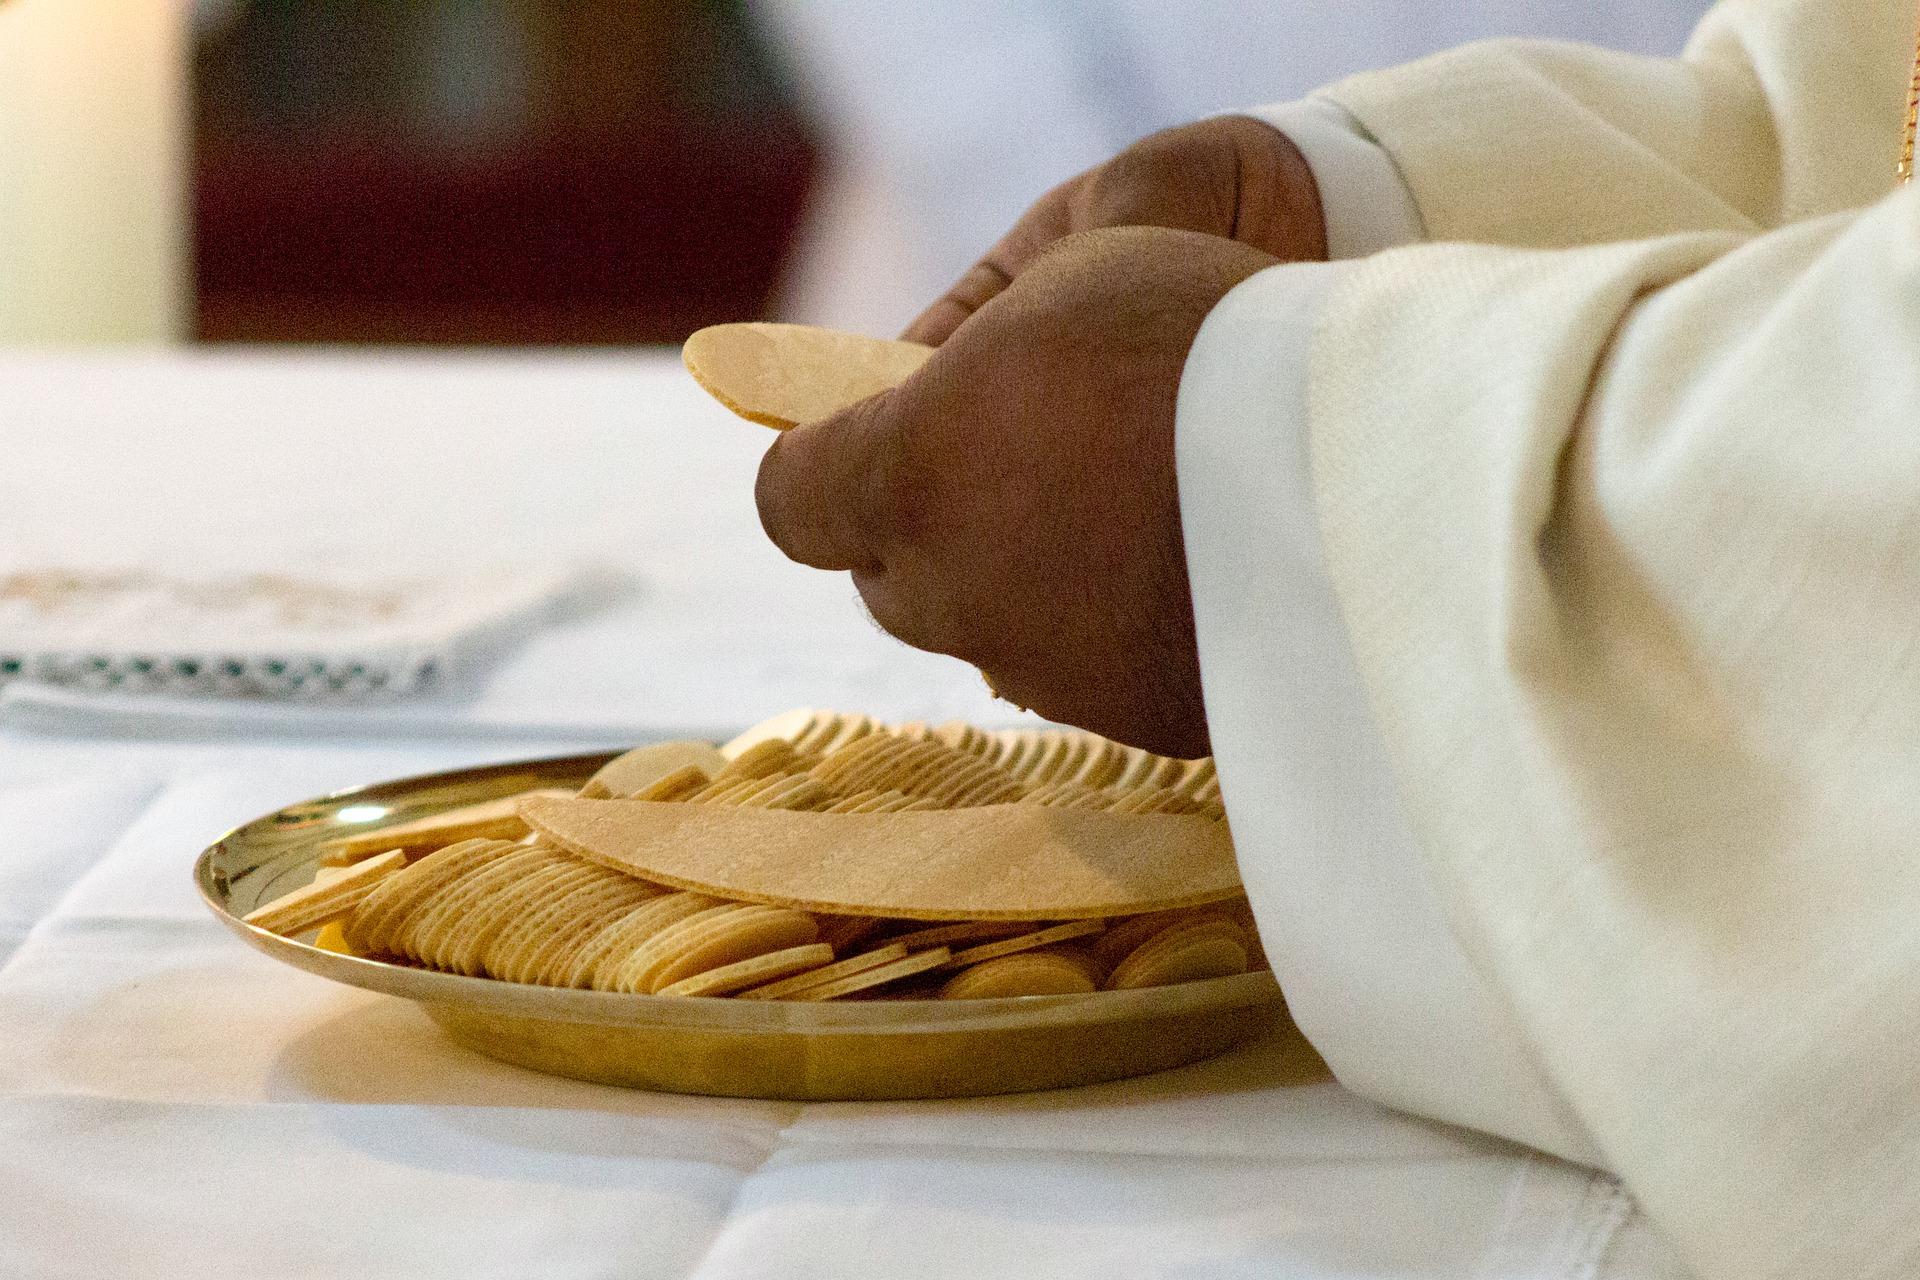 celebration-of-the-eucharist-5243045_1920